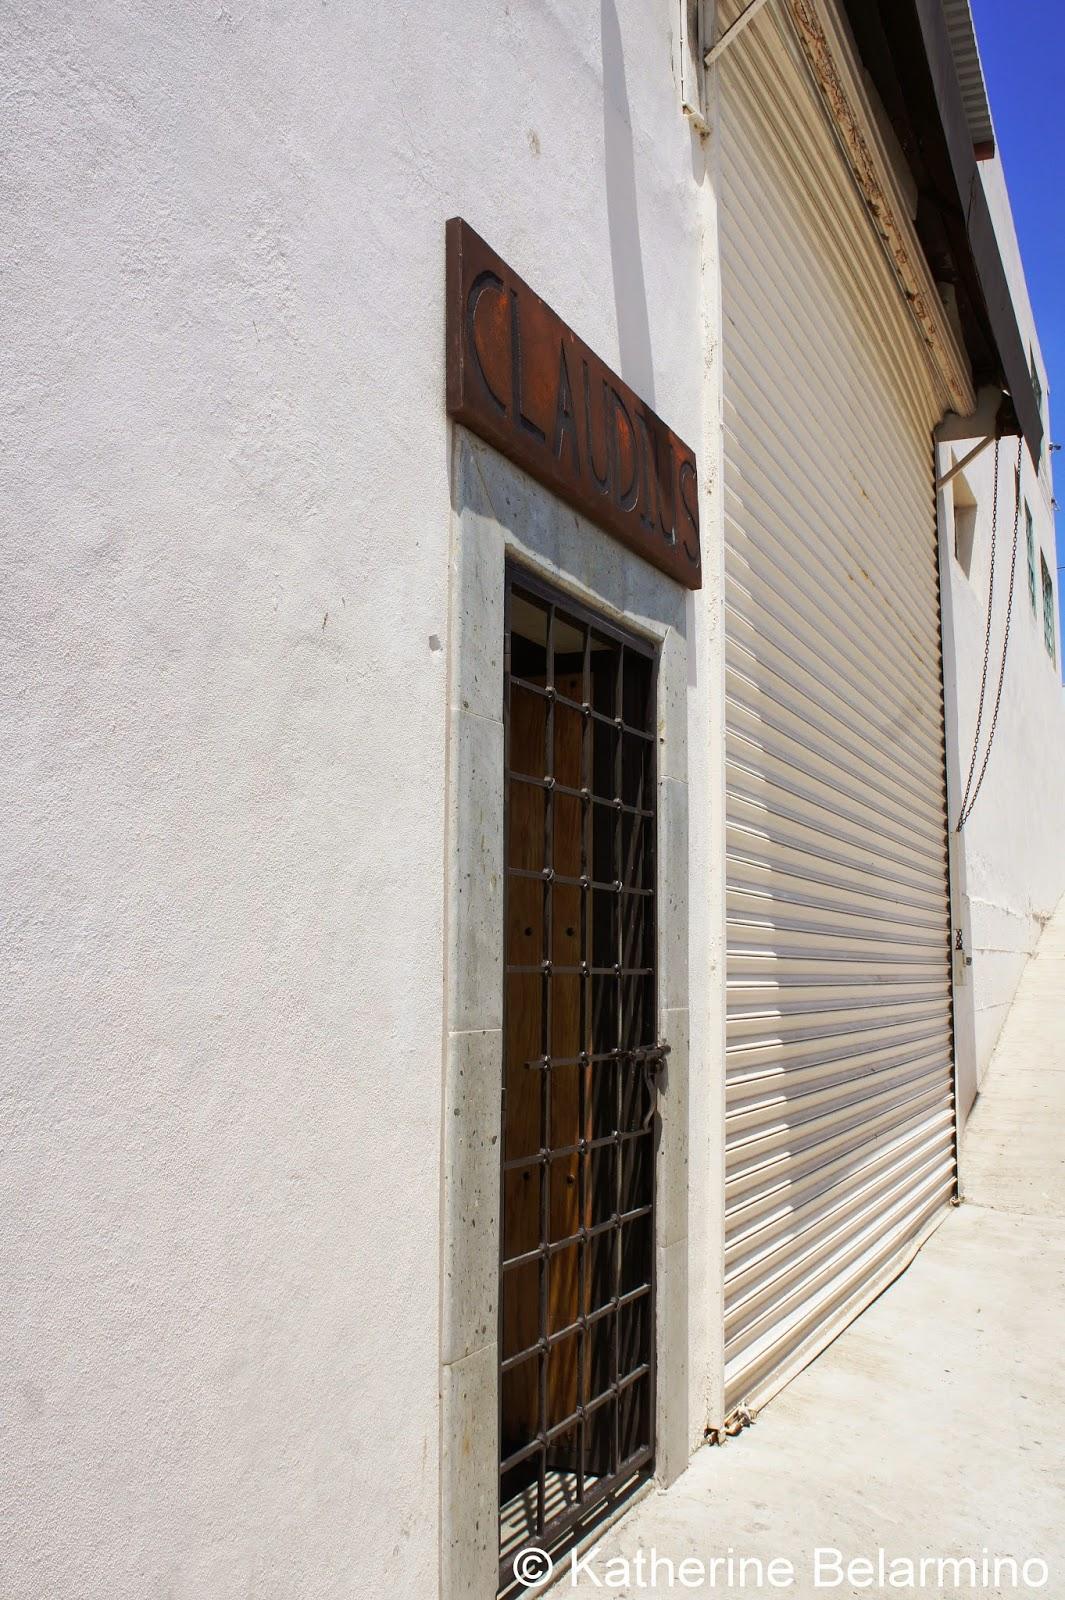 Claudius Viña y Bodega Rosarito Baja California Mexico